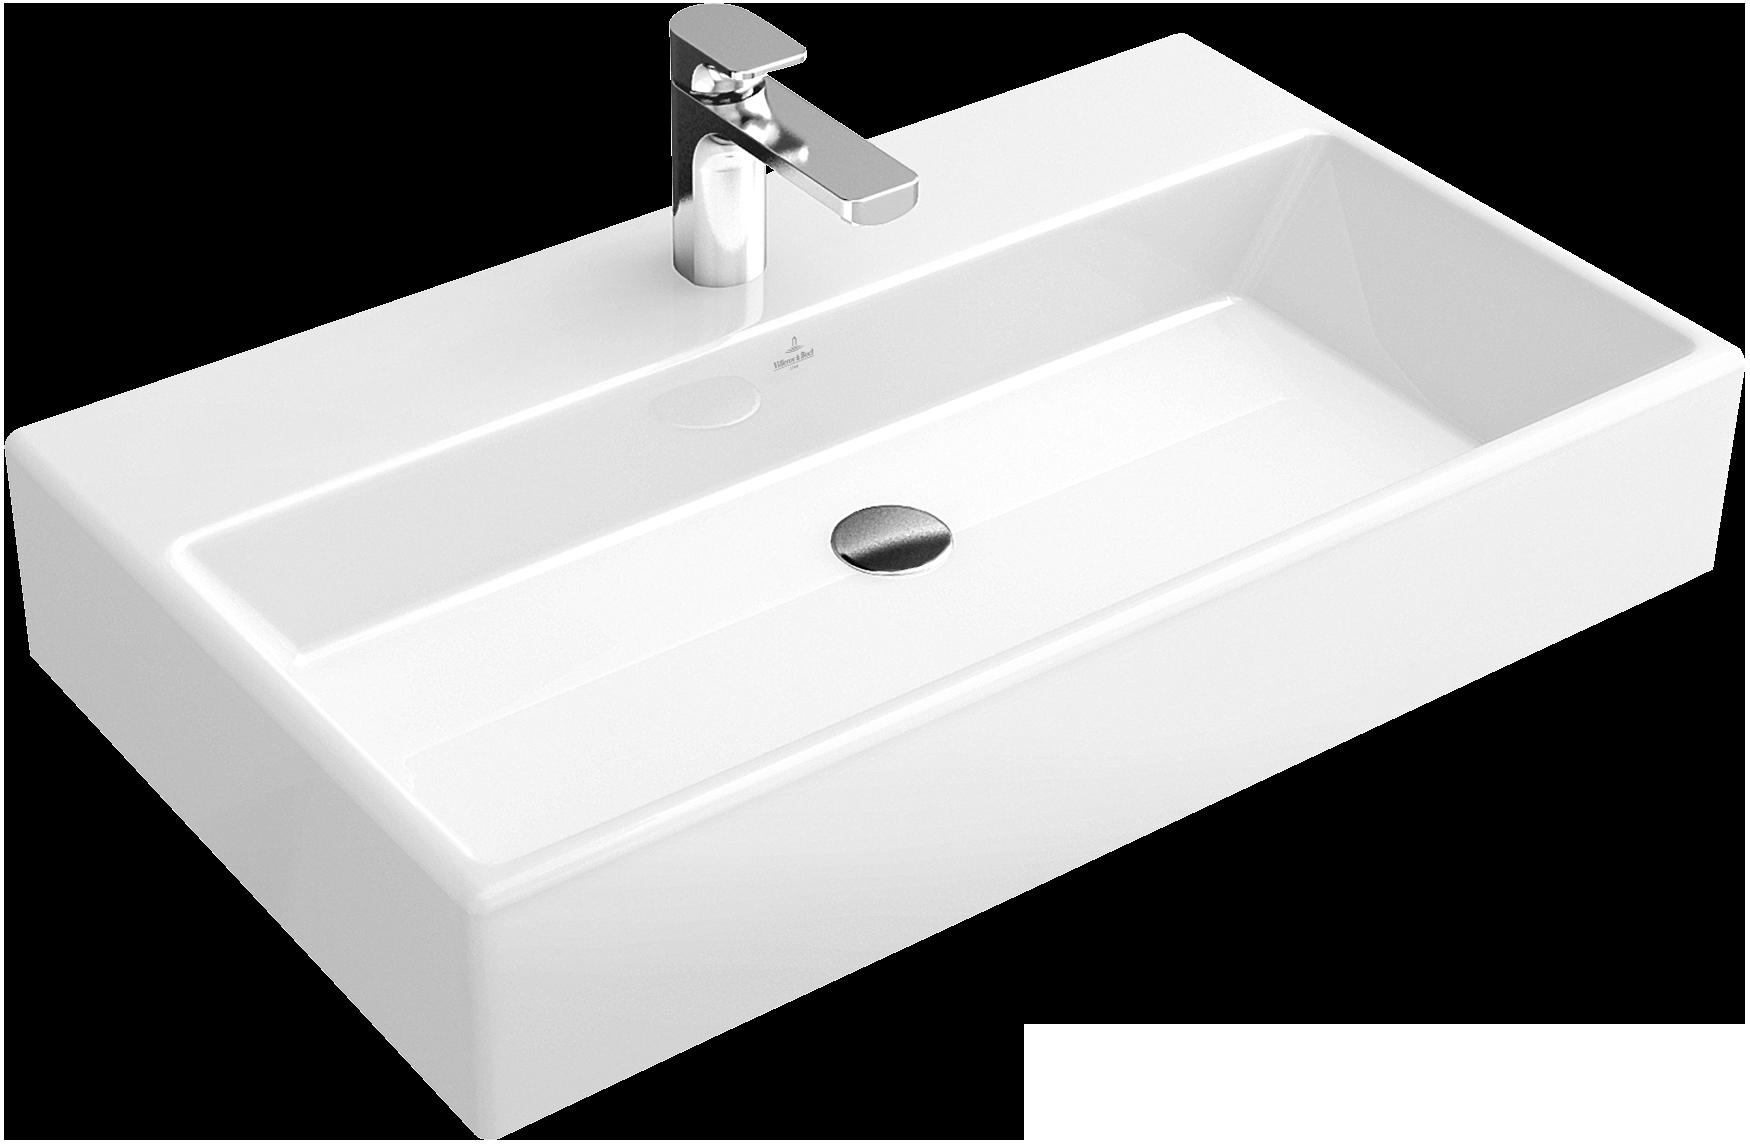 memento waschtisch eckig 51338g villeroy boch. Black Bedroom Furniture Sets. Home Design Ideas